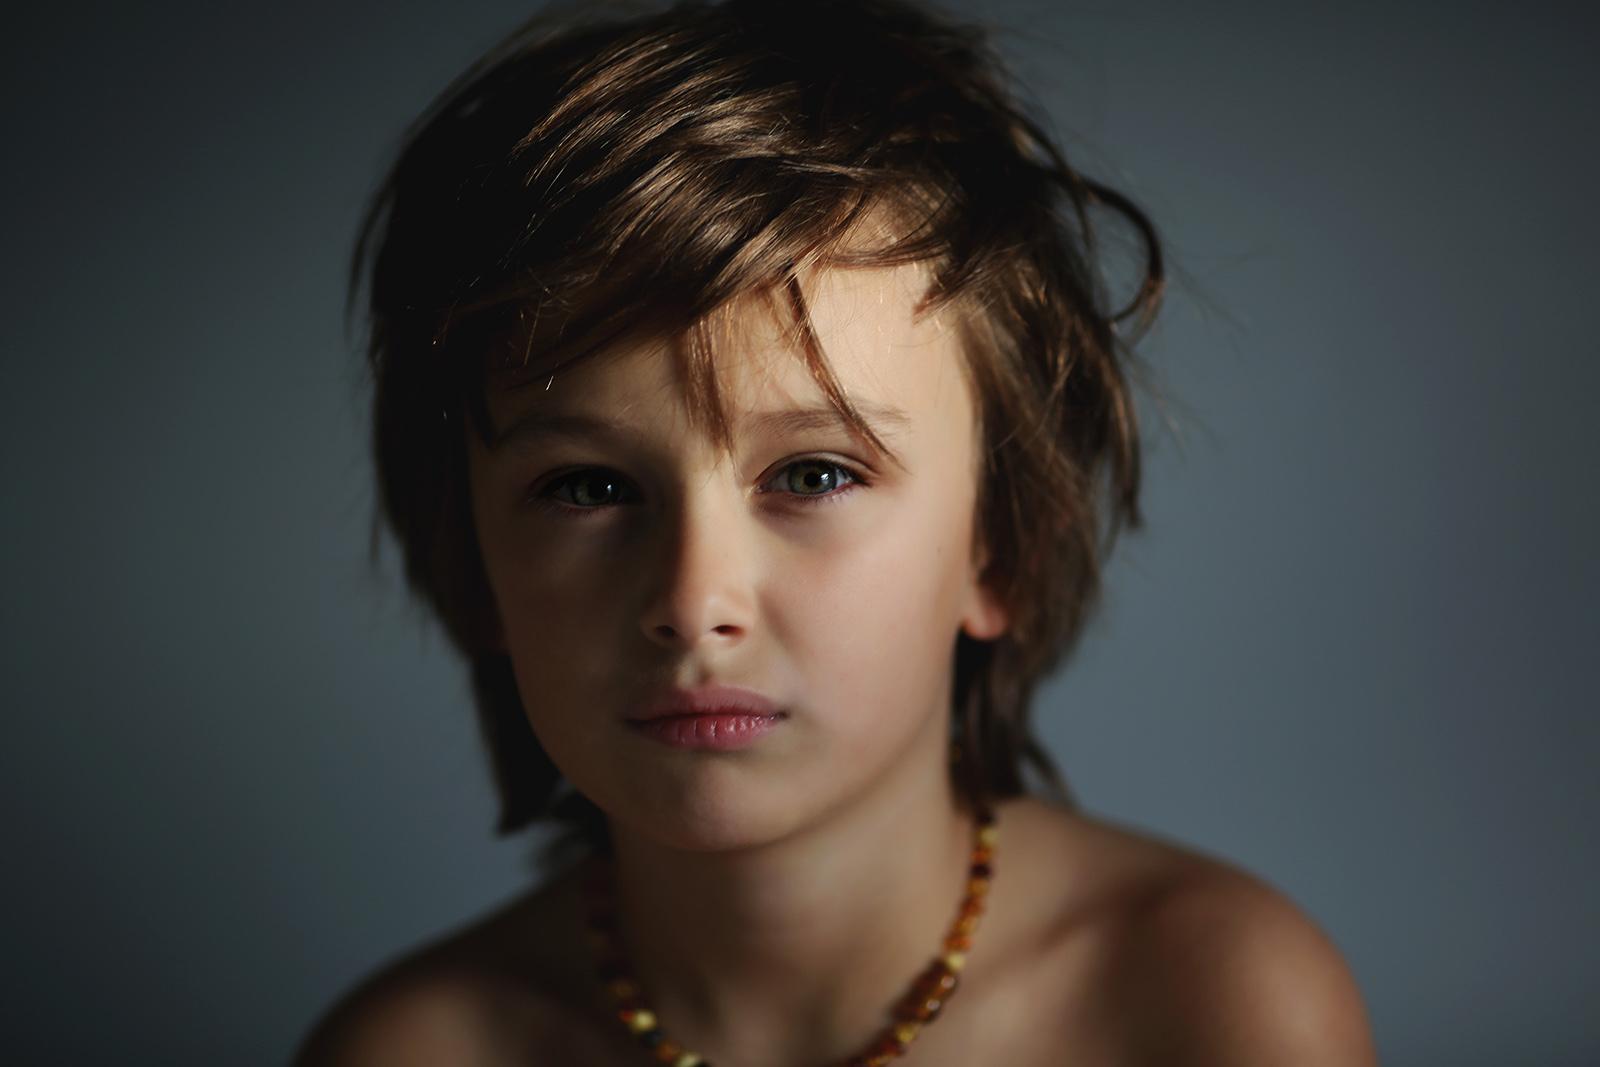 headshot-of-boy-by-Elena-Blair.jpg